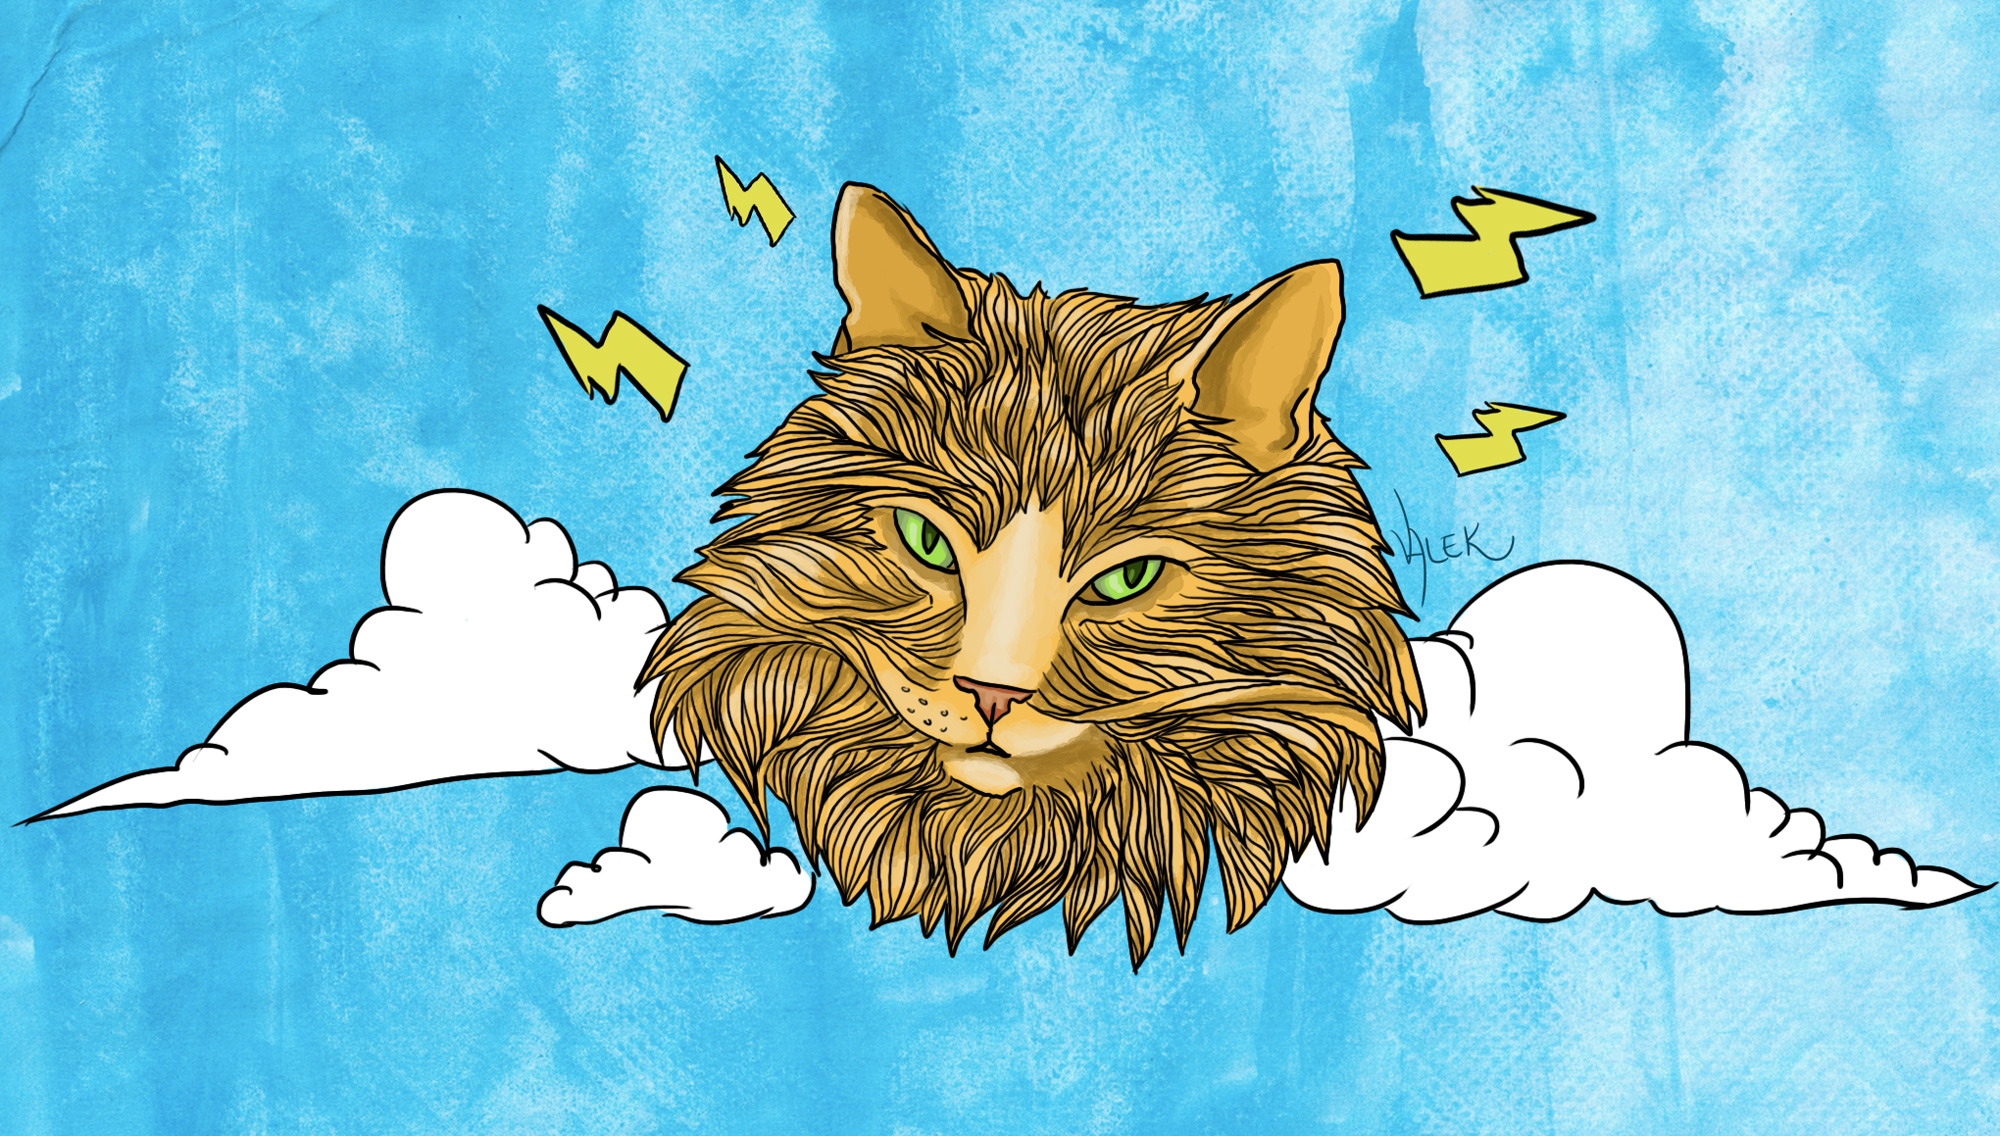 Descobri que meu gato é deus